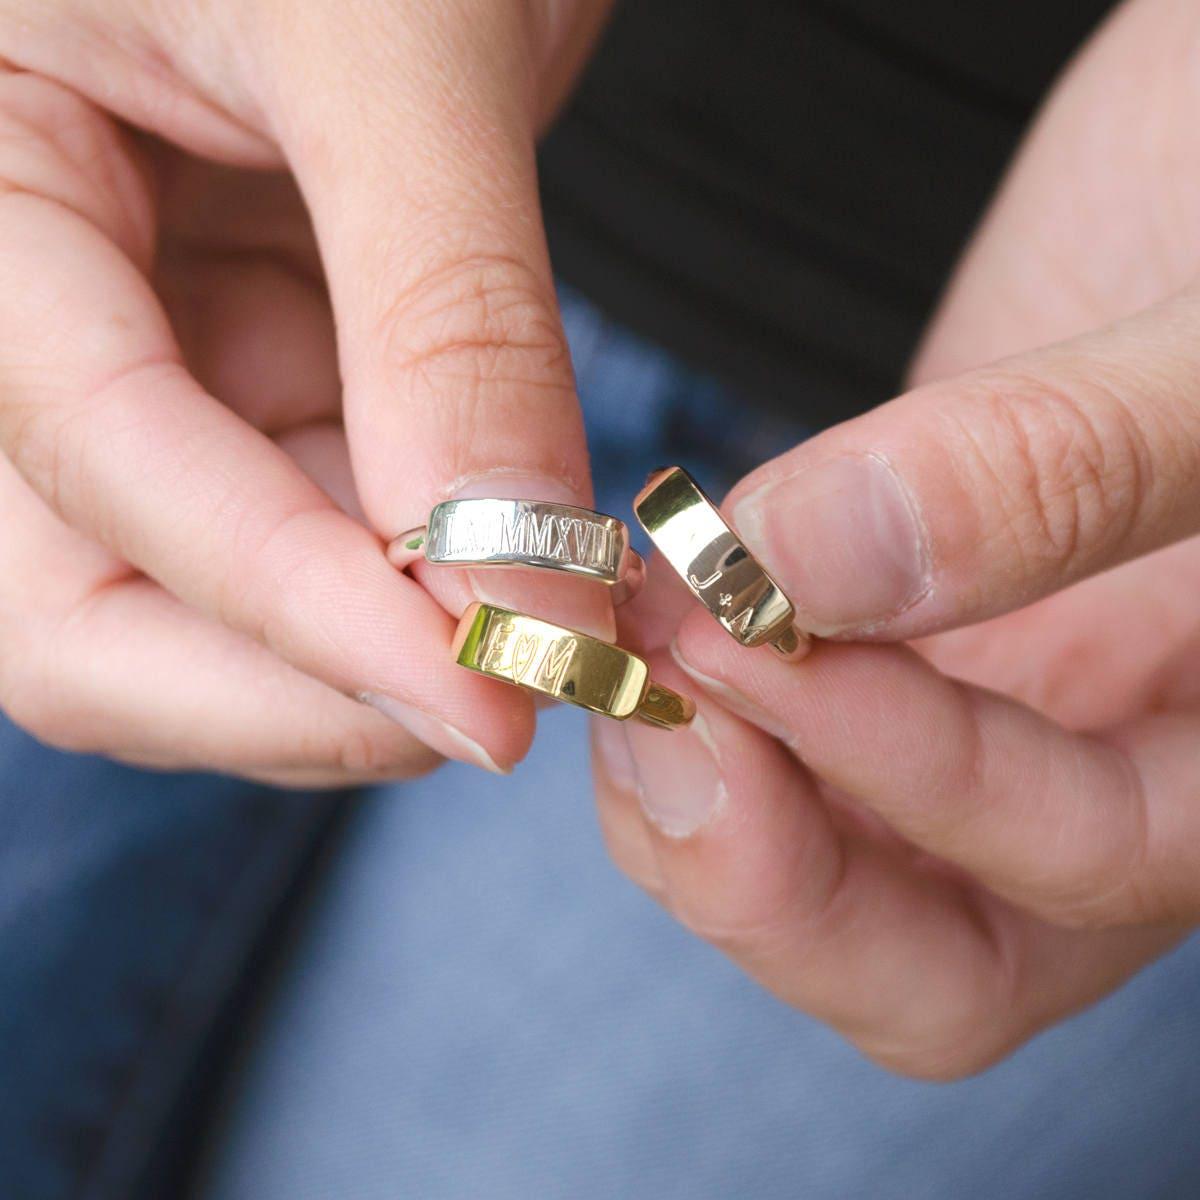 Personalized Name Ring Custom Engraved Ring Name Bar Ring